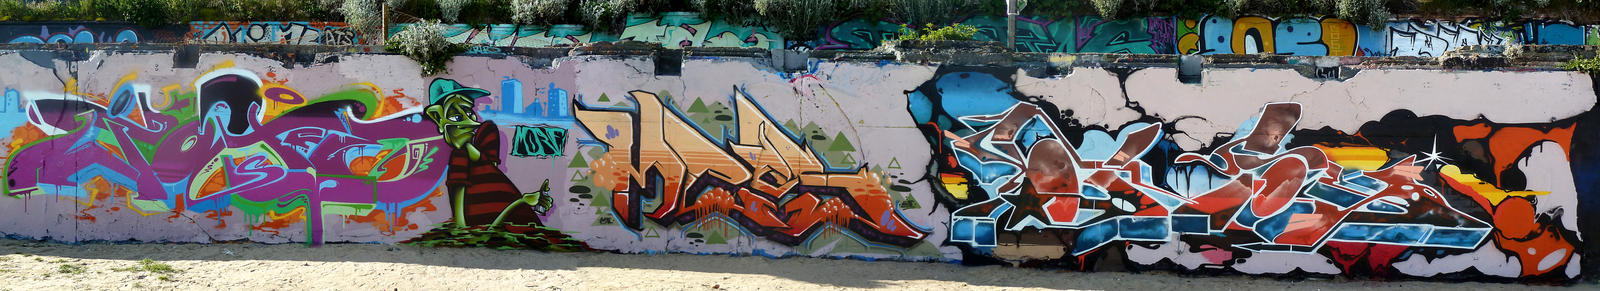 Jate Morf Mecs Rebus by pagR